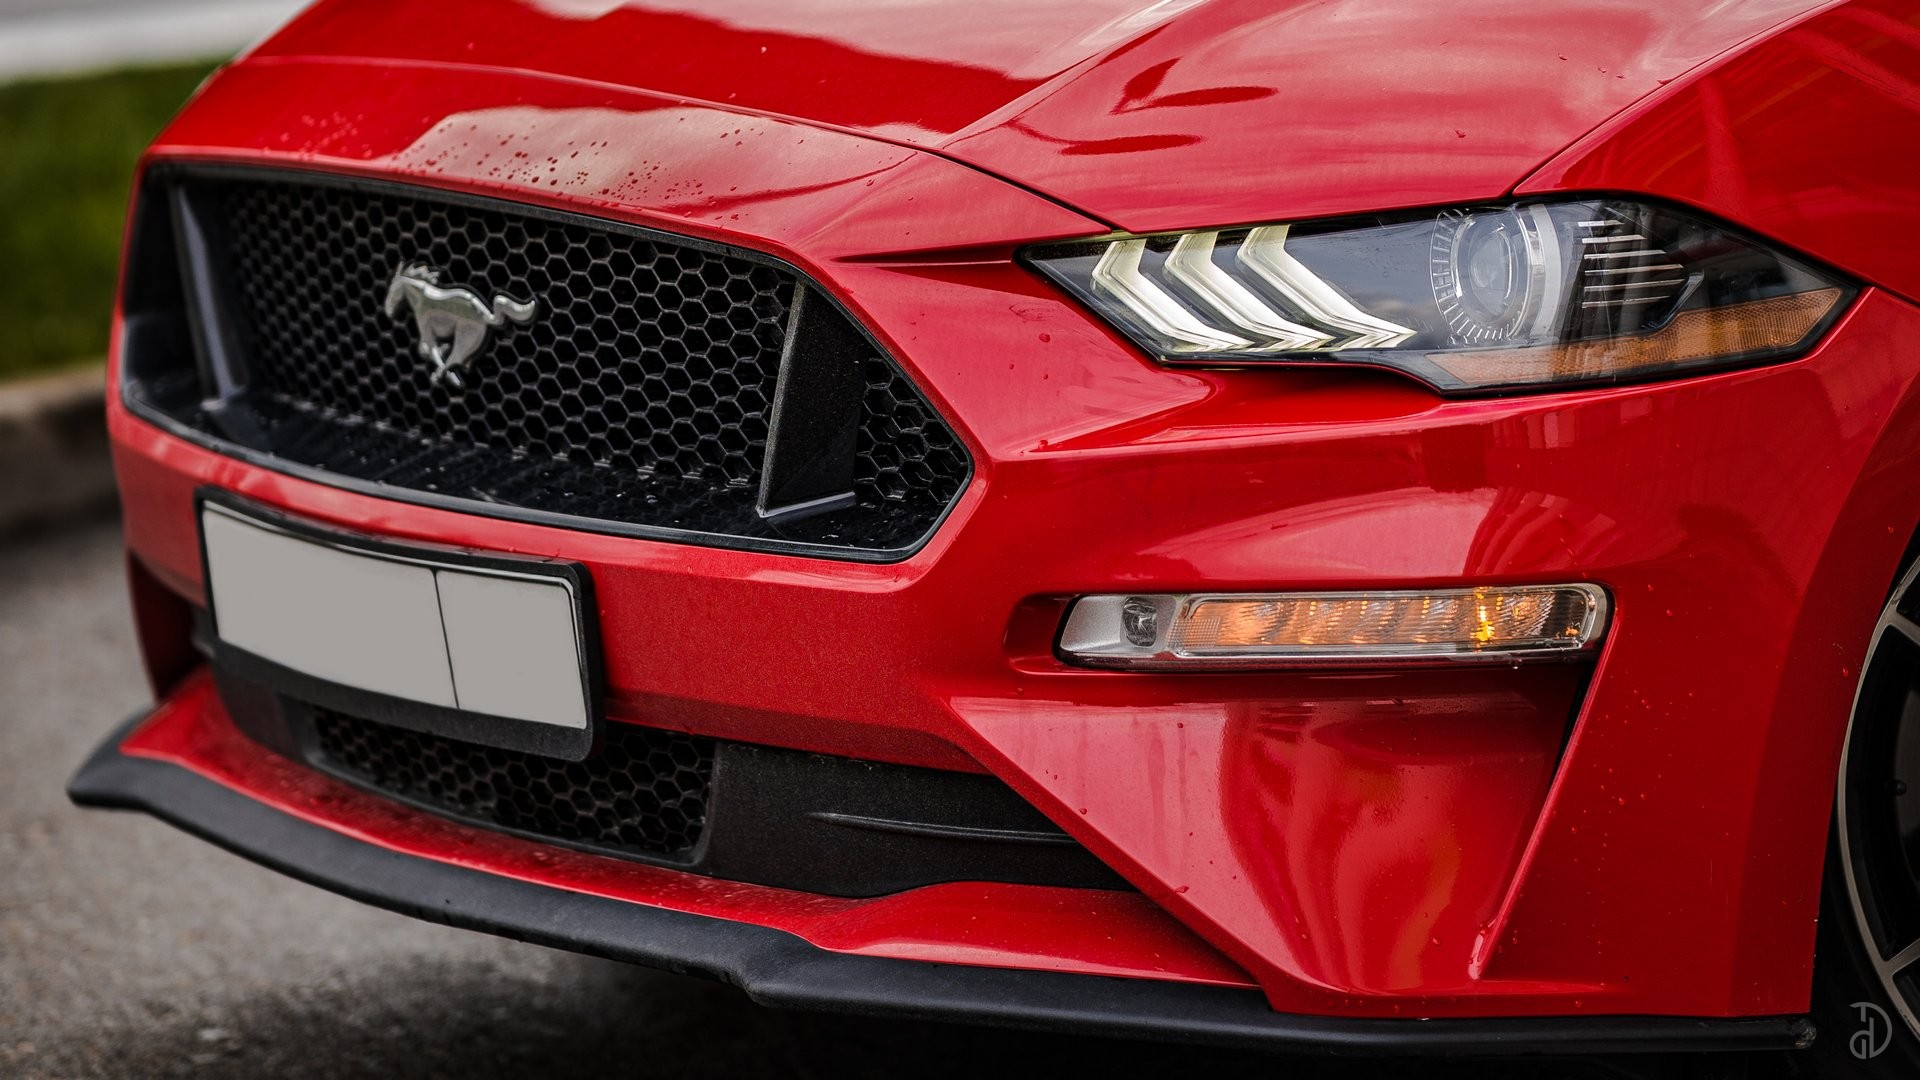 Аренда Ford Mustang GT 5.0 в Сочи. Фото 3